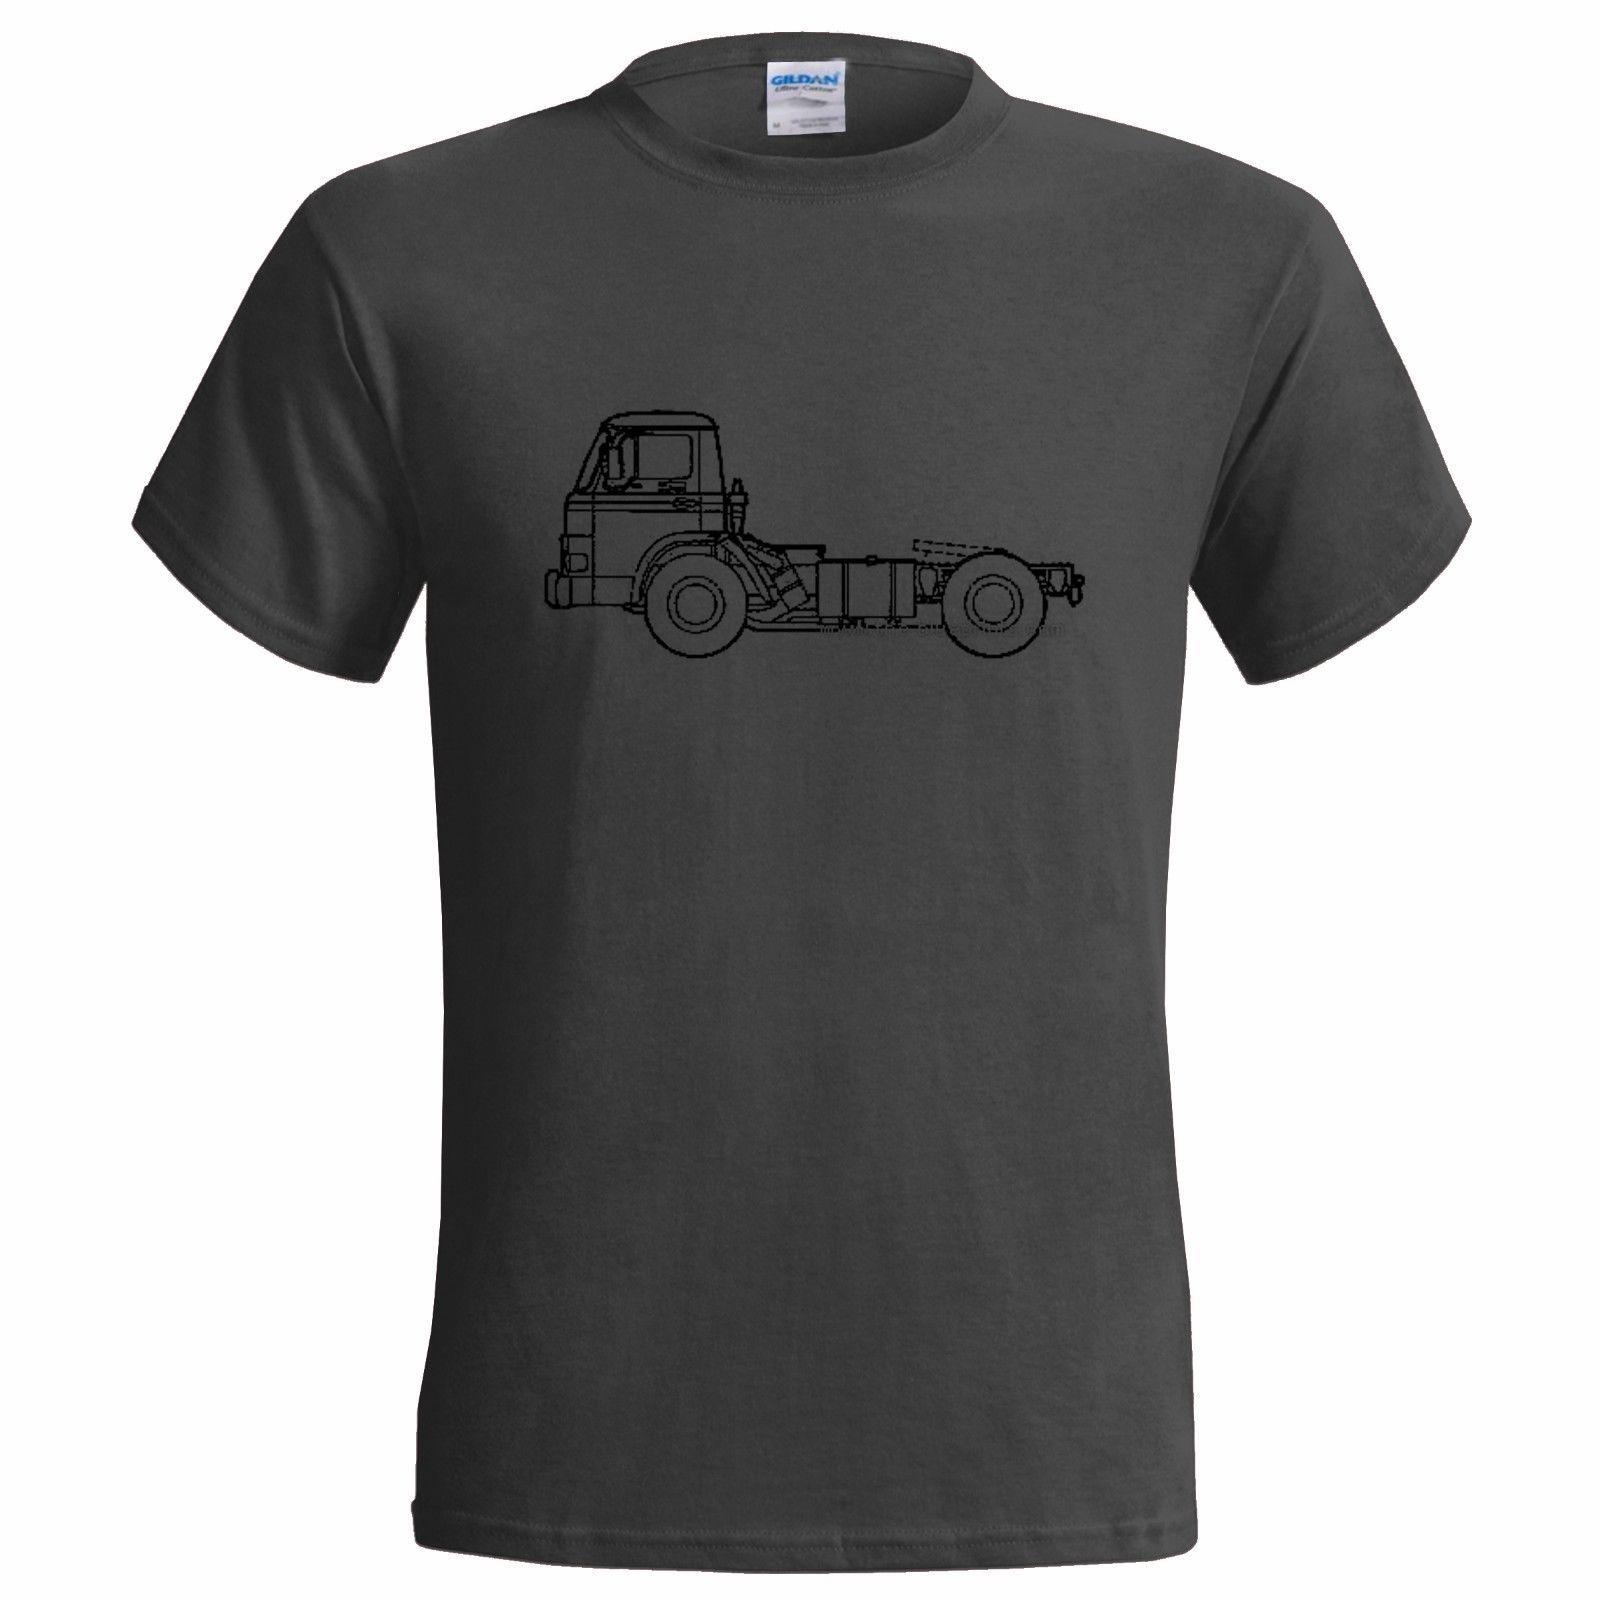 Мужчины T рубашка 100% хлопок печати Рубашки ED серии ТРАКТОР MENS T SHIRT НАСТОЯЩЕЕ ФАРМ FARMING ФЕРМЕР TRUCK Tee Shirt